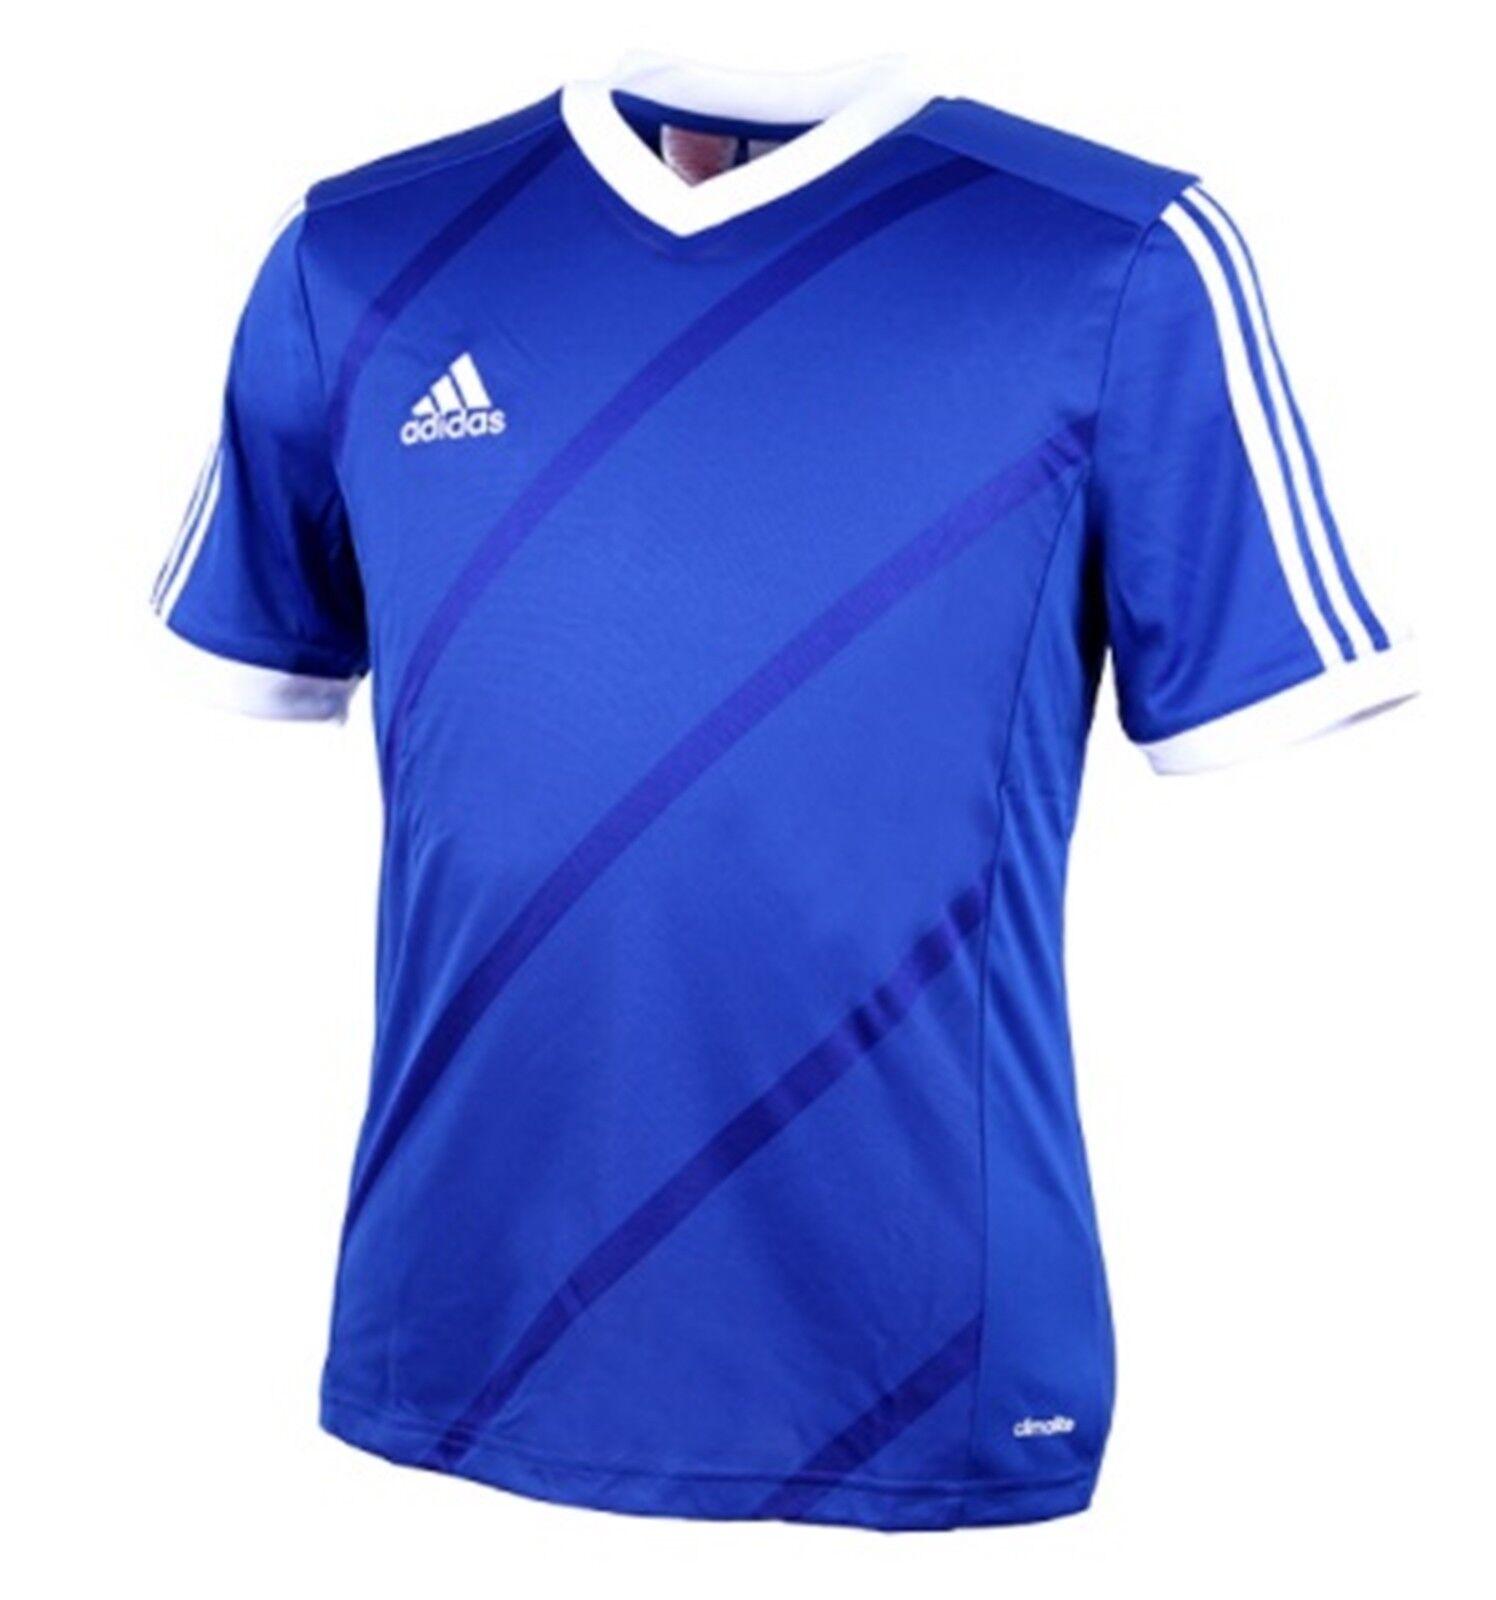 Adidas Jeunesse Tabela 14 Entraînement Soccer Climalite Bleu Blanc Enfant Shirts F50452